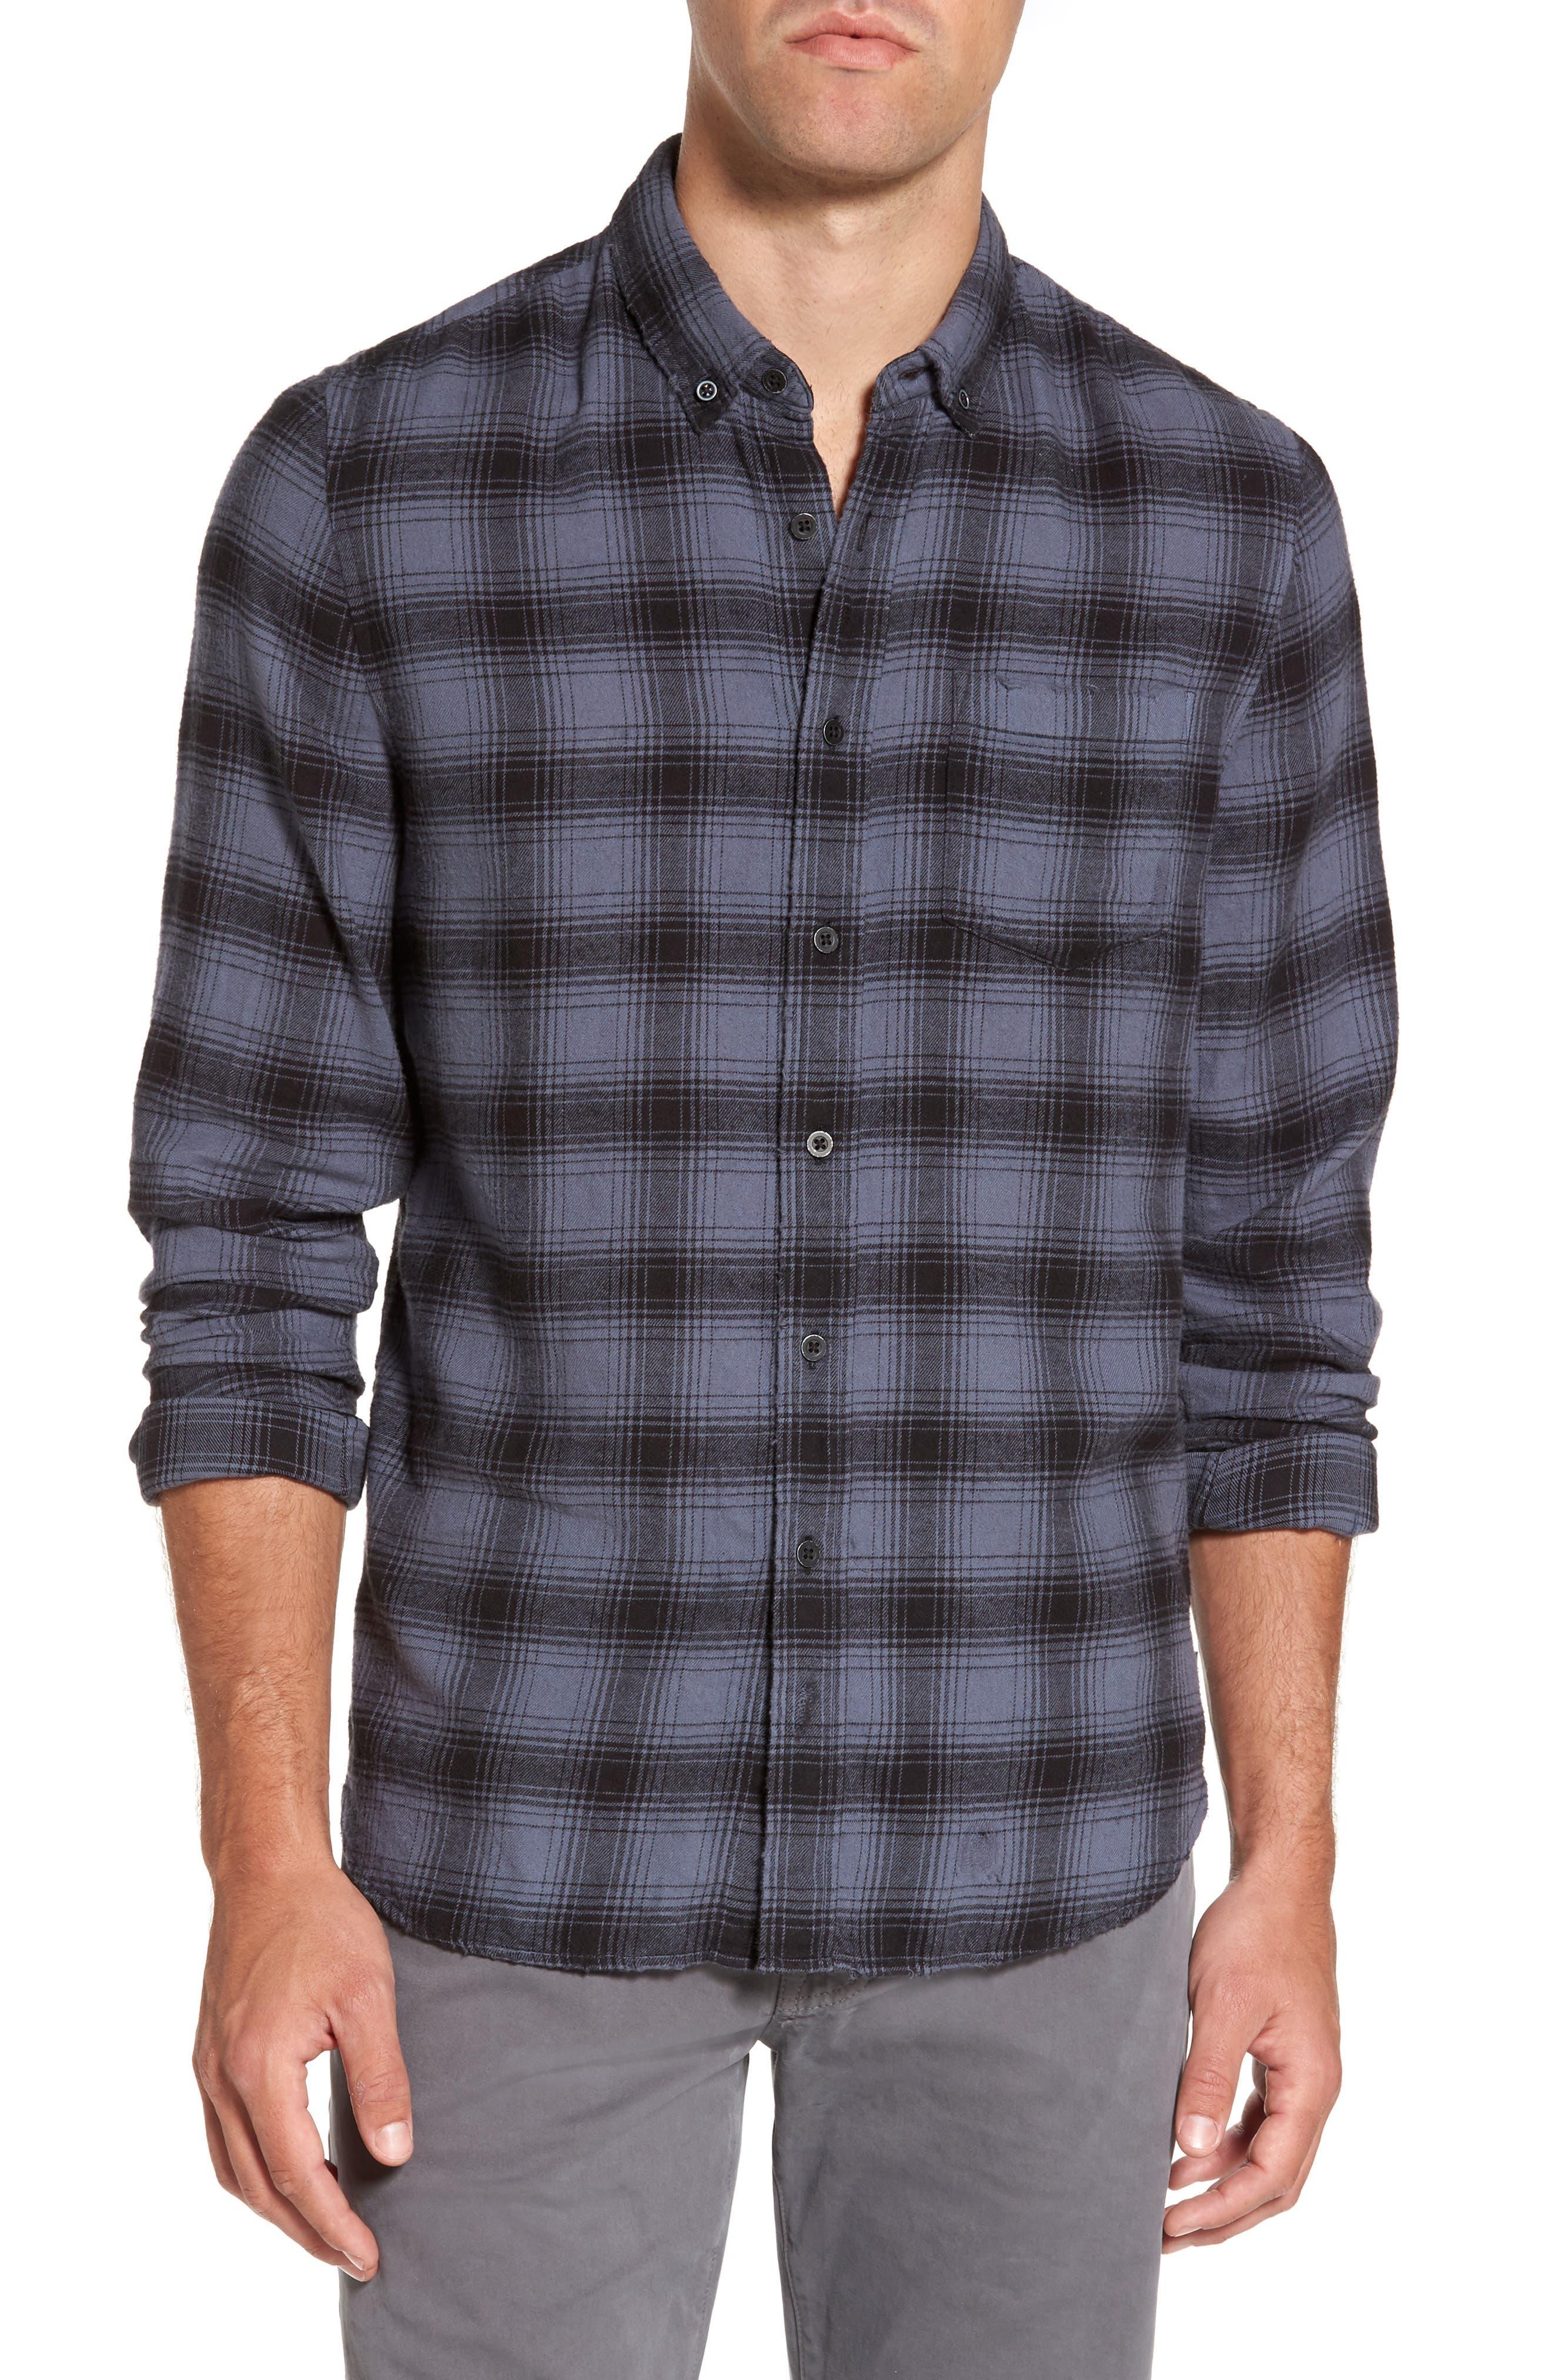 Grady Plaid Flannel Sport Shirt,                             Main thumbnail 1, color,                             008